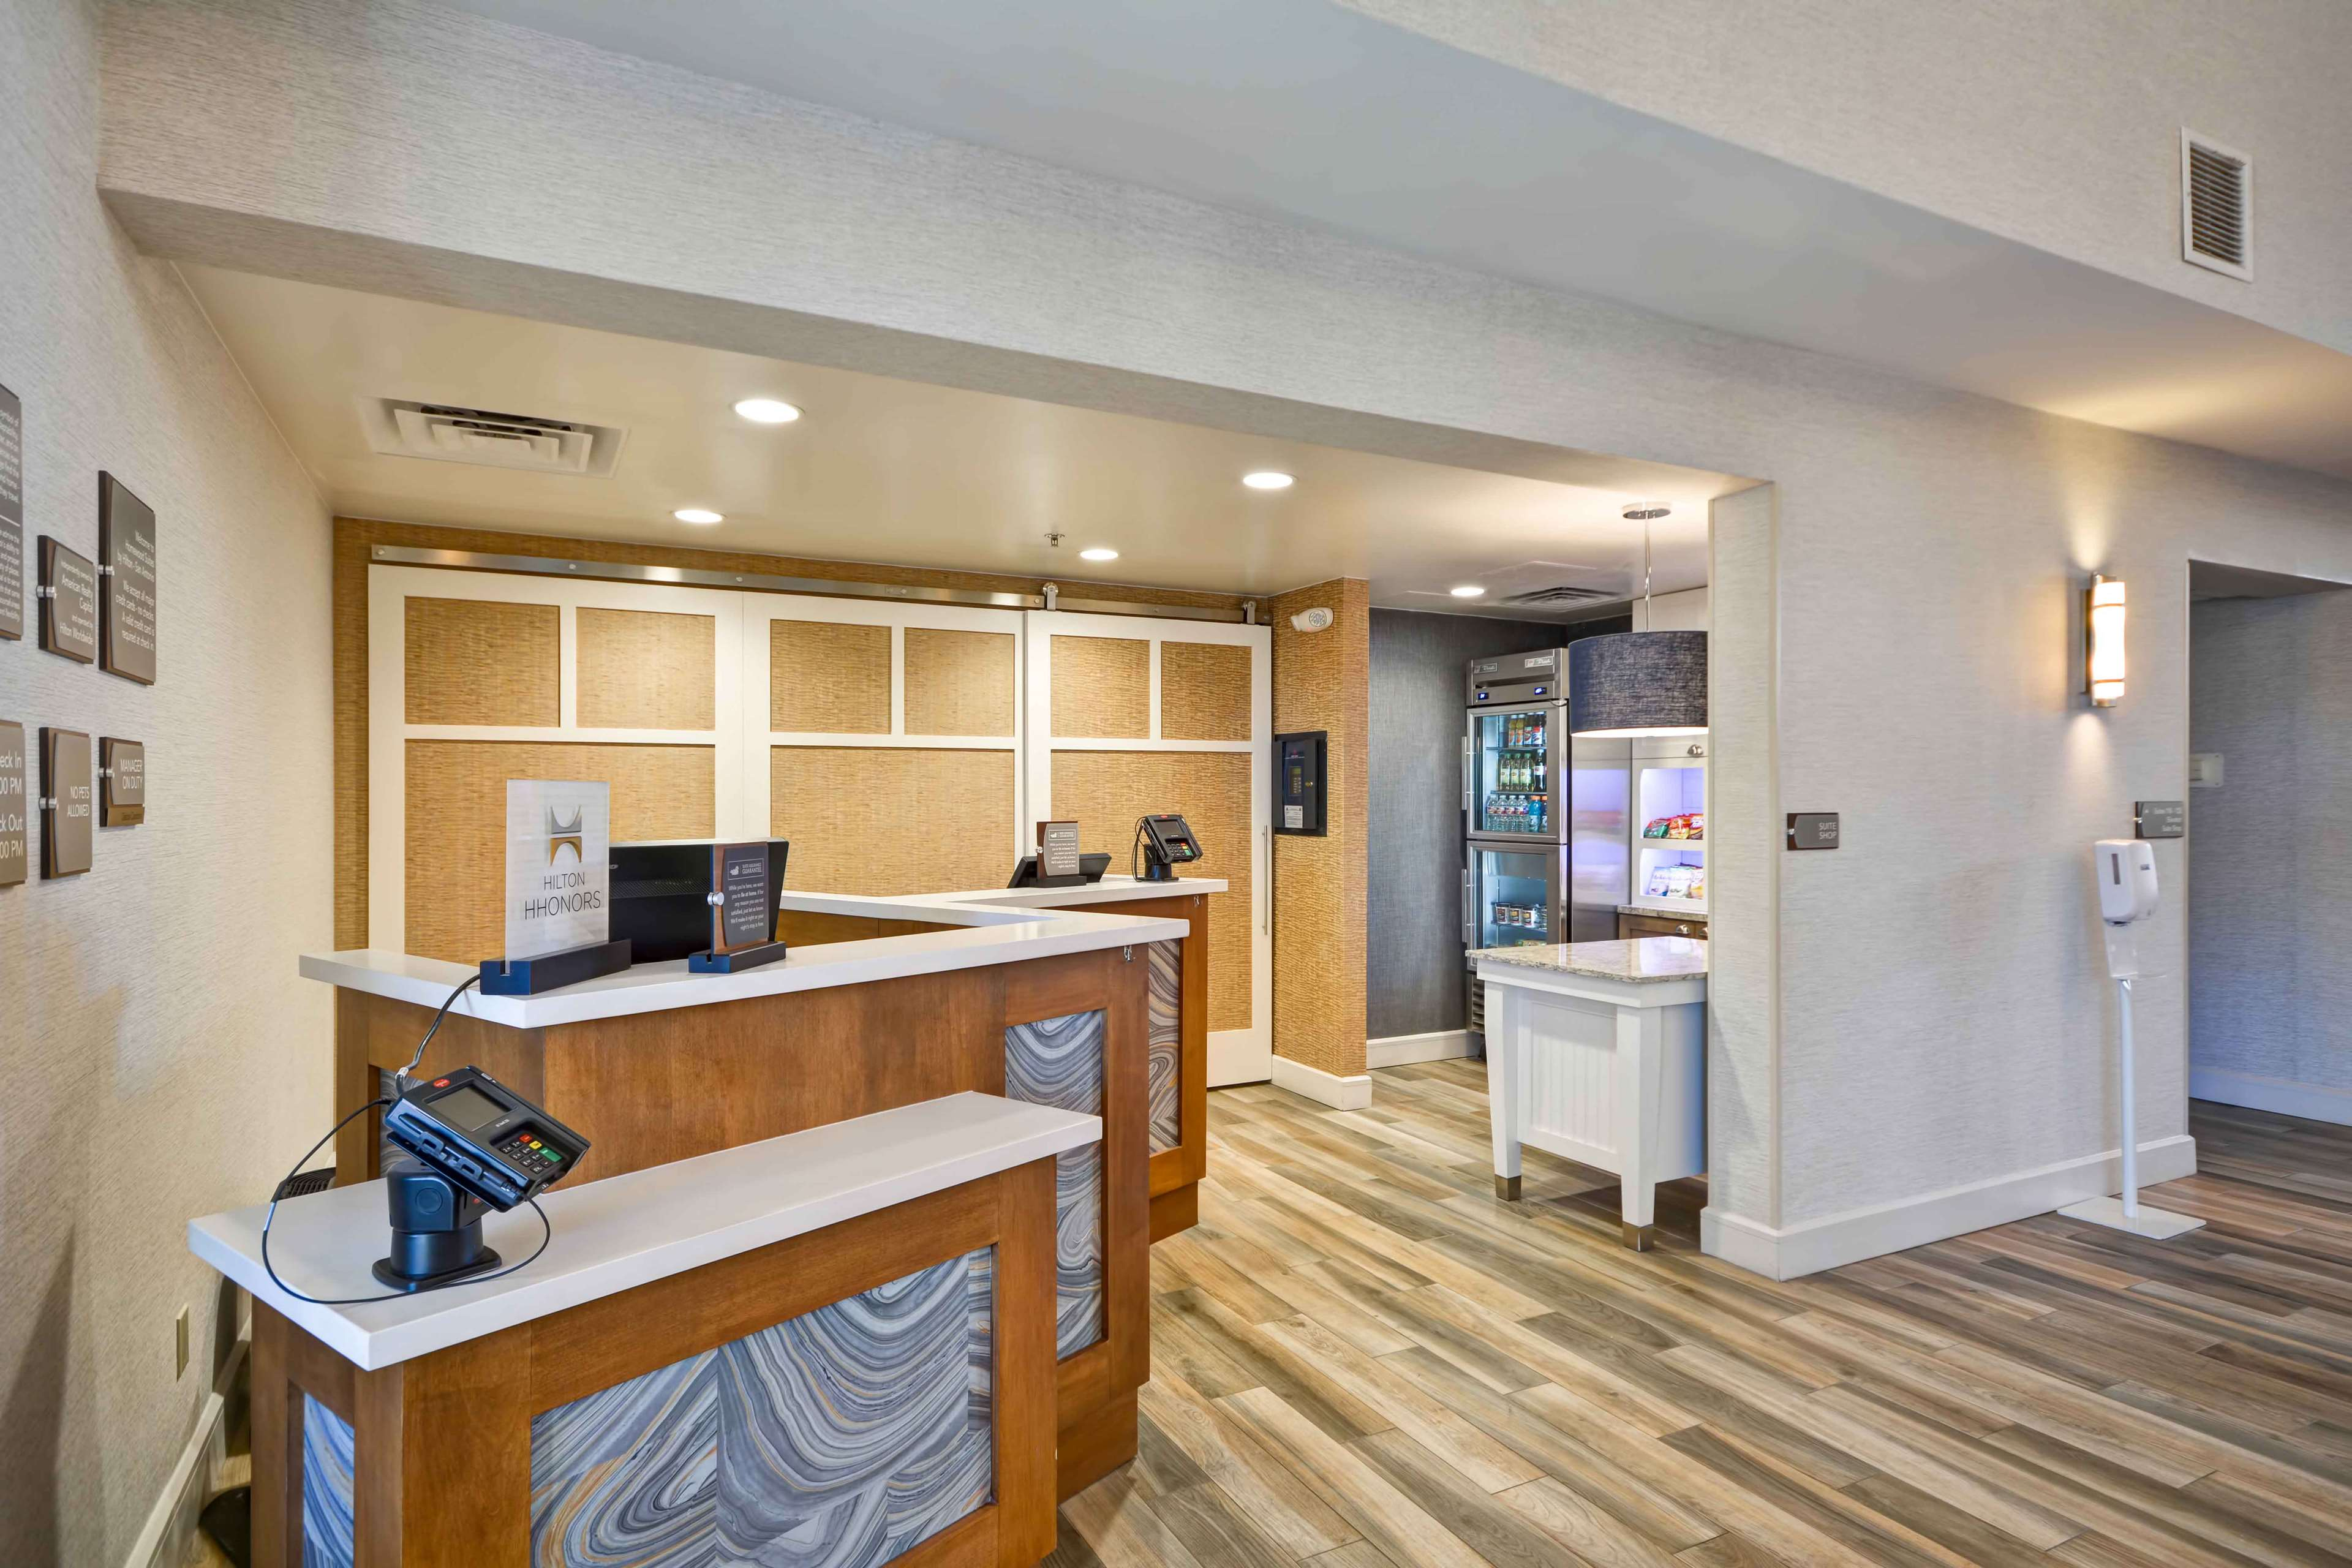 Homewood Suites by Hilton San Antonio-Northwest image 2